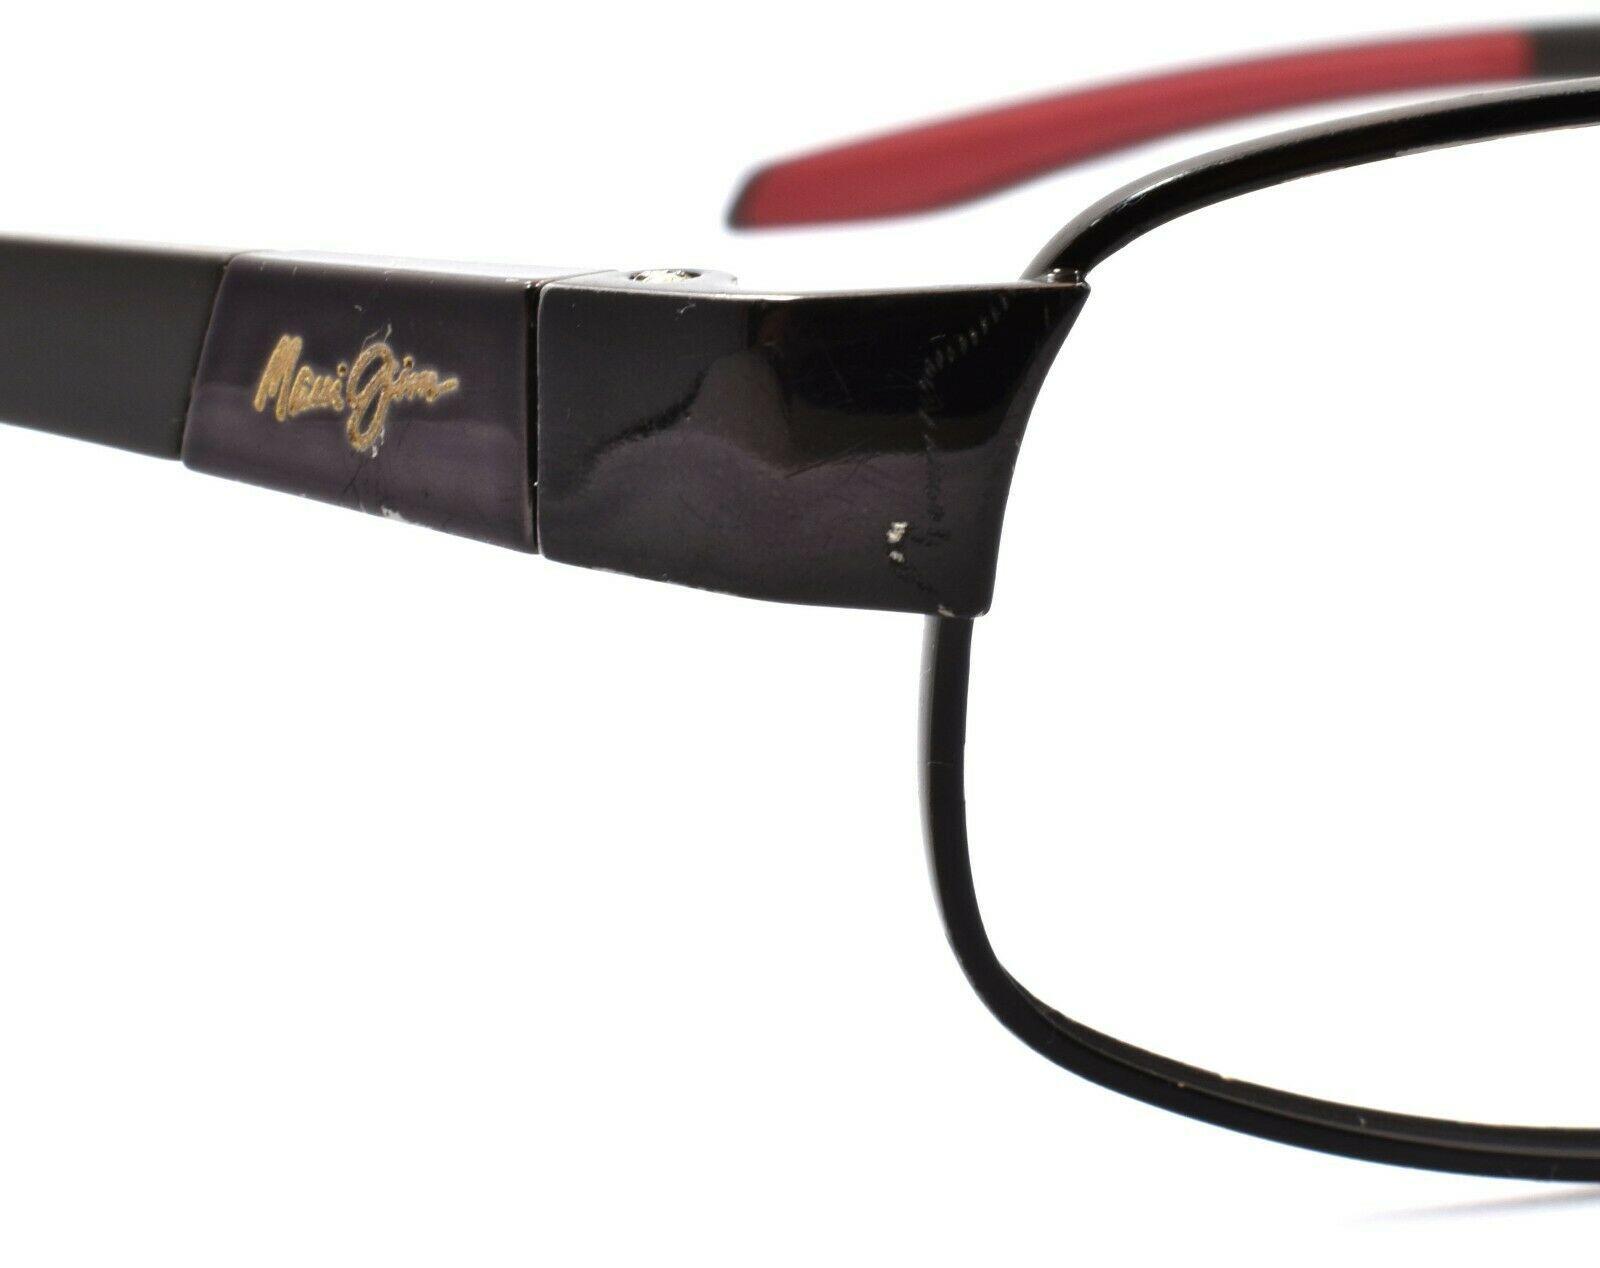 Maui Jim MJ741-20A Salt Air Sunglasses 60.5-17-135 Bronze FRAME ONLY